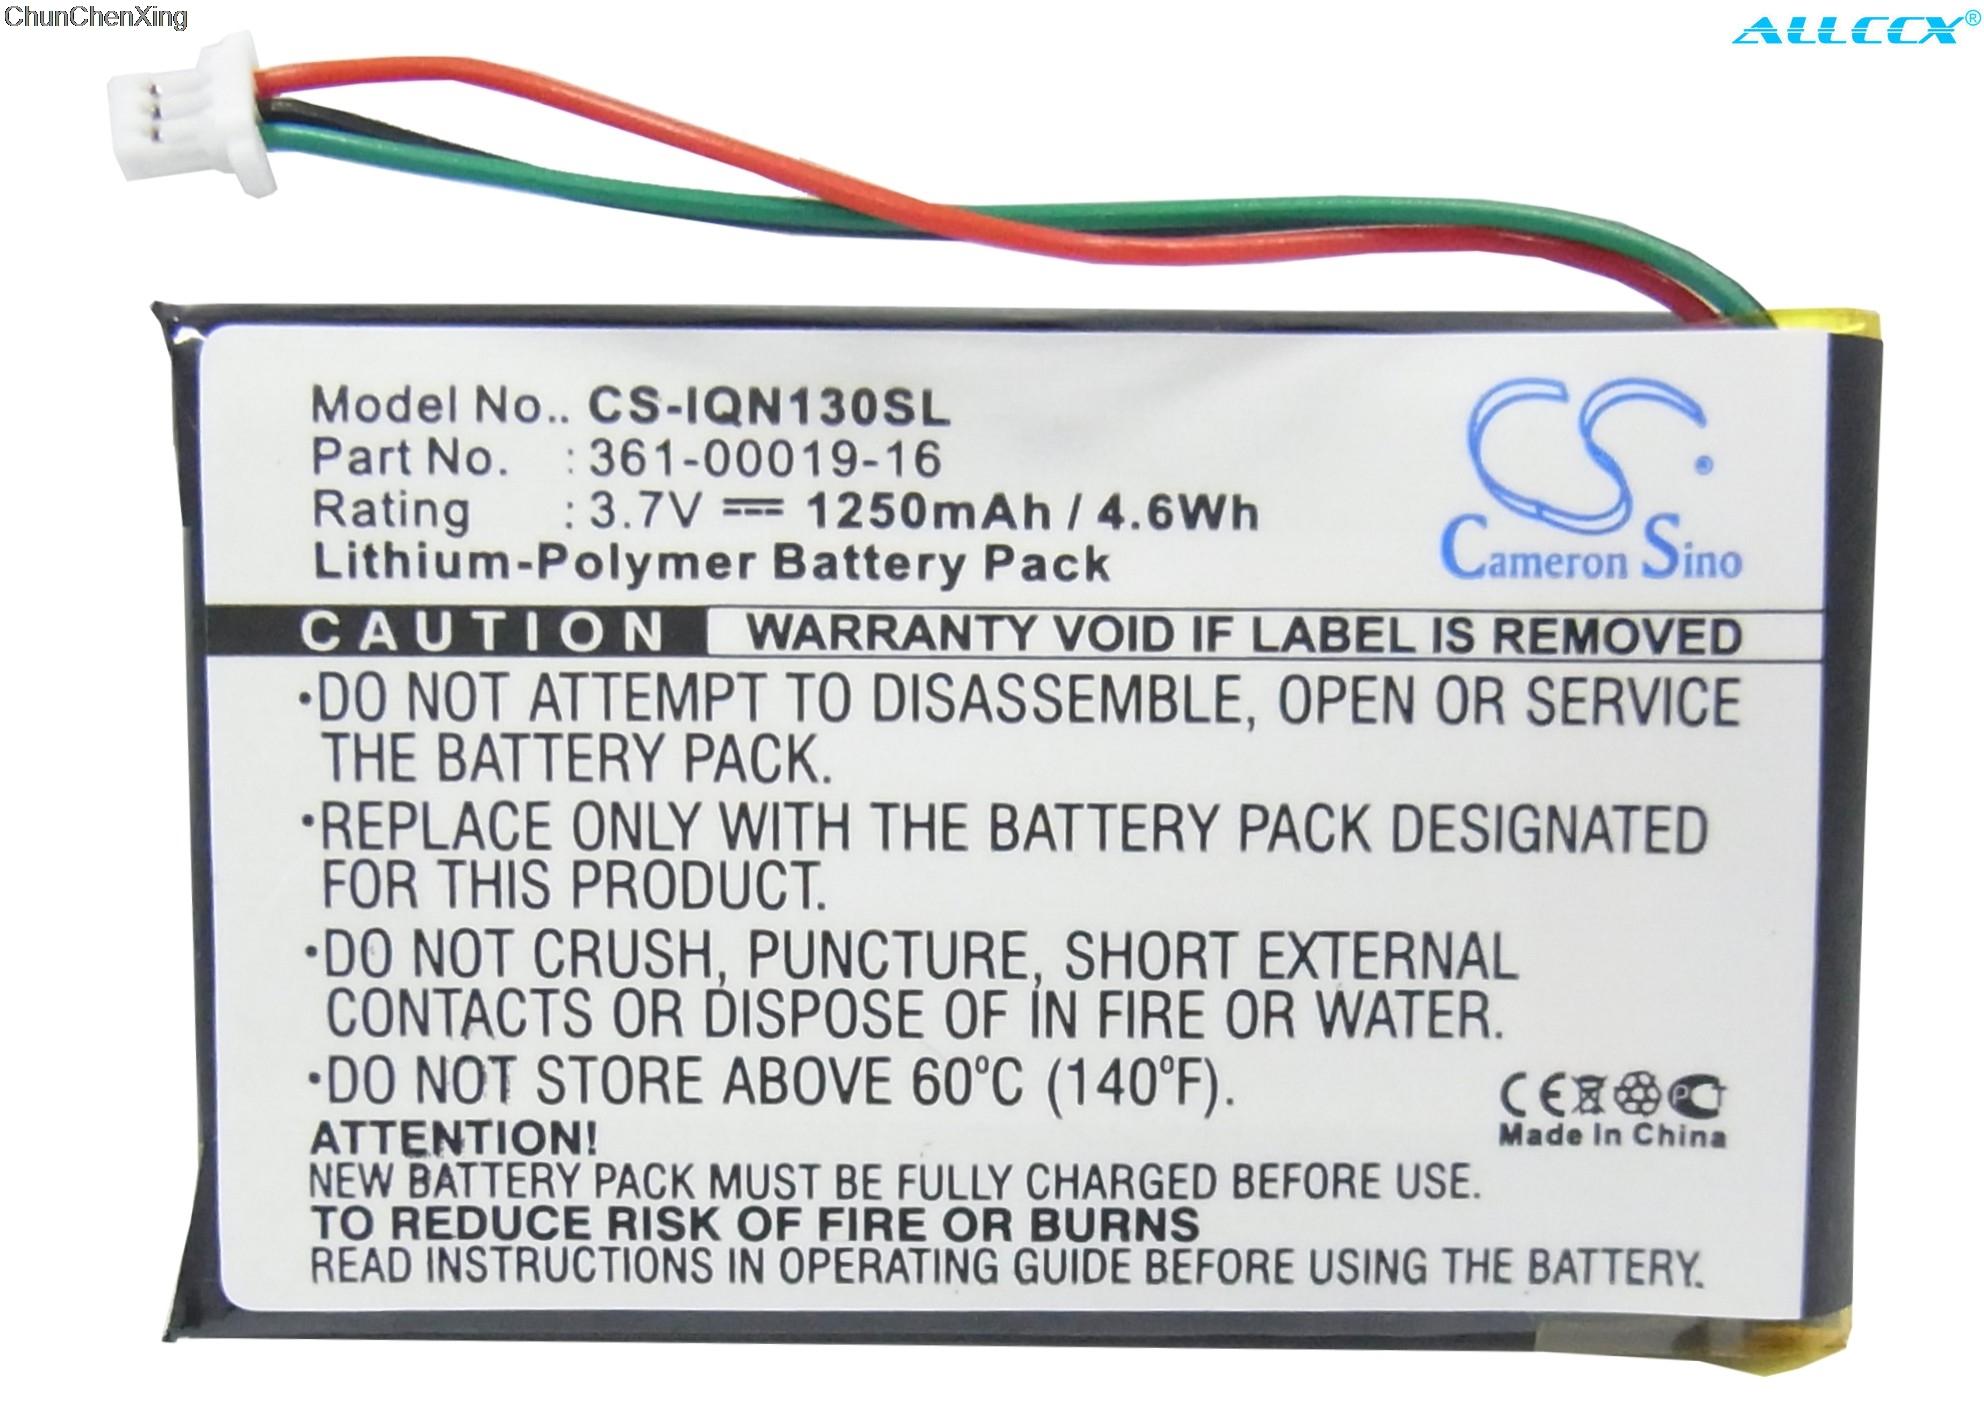 010-01211-01 Nuvi 65LM Cameron Sino 1100mAh Battery for Garmin 361-00056-01 Nuvi 65